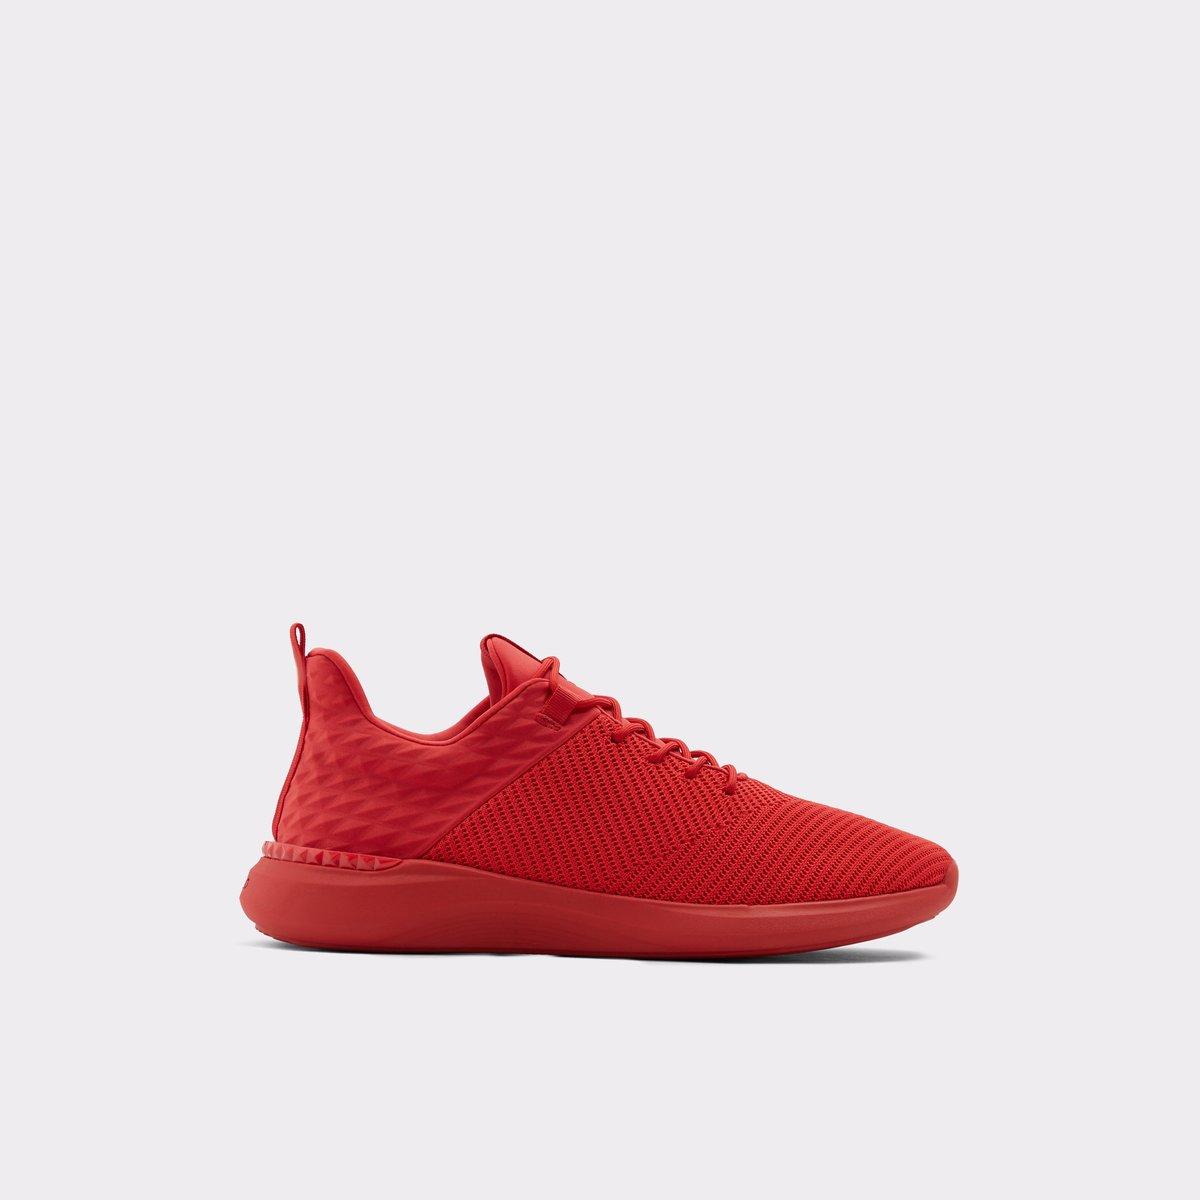 aldo red shoes inexpensive c27f4 b50c5